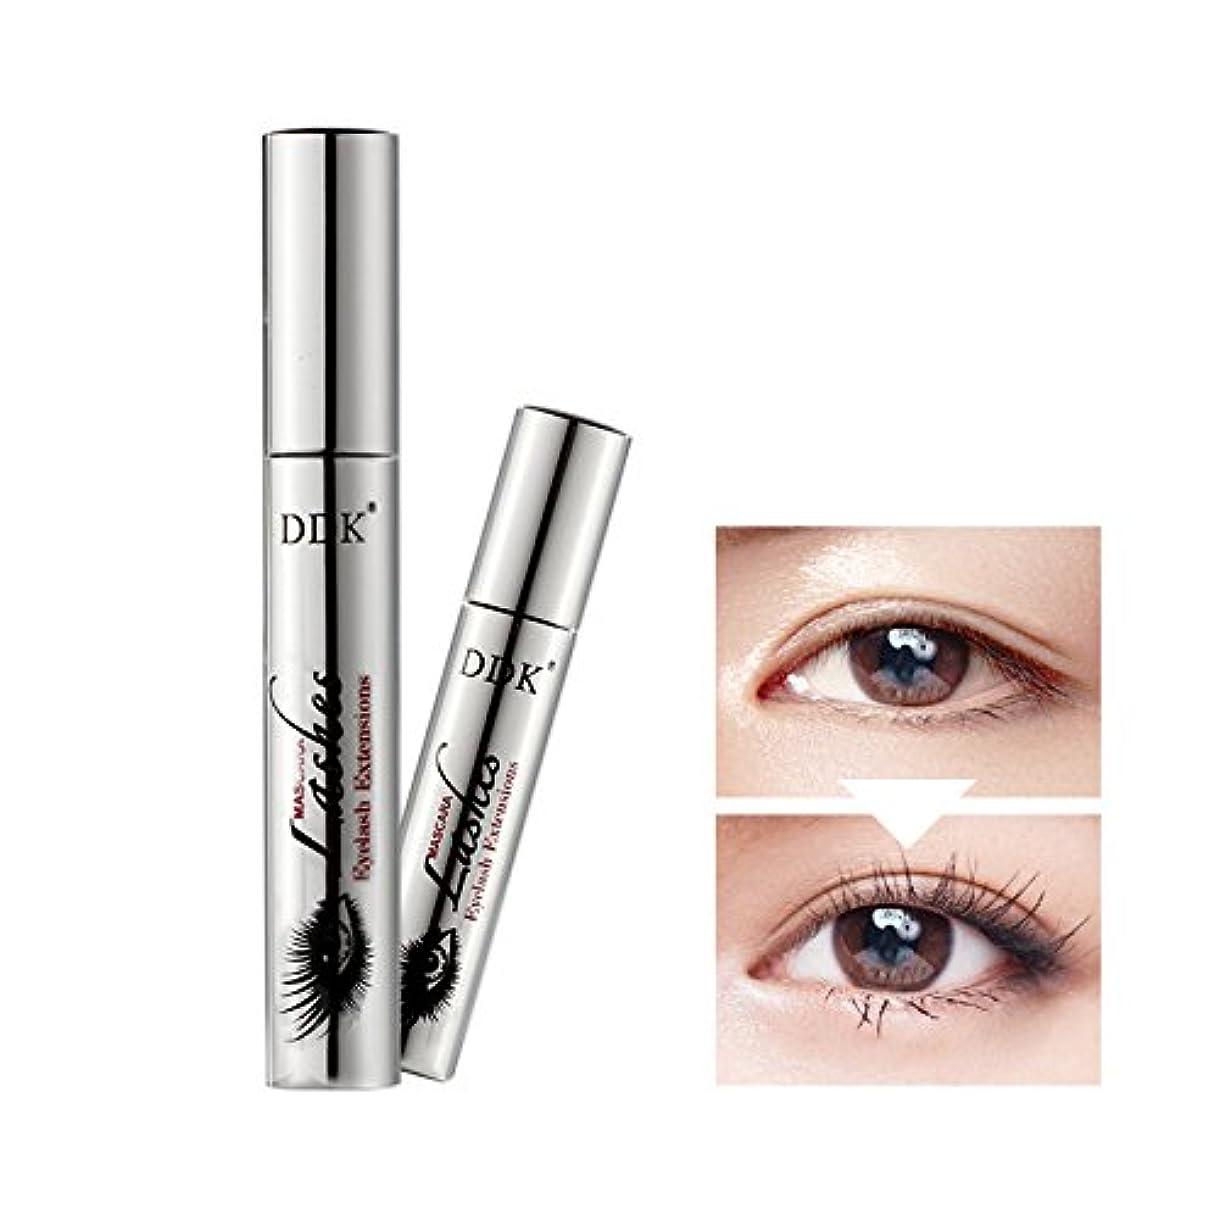 Beautygram DDK 4D MASCARA 4D マスカラ Long Extension Amazing Eyelash ロング エクステンション アメージング まつ毛 [並行輸入品]